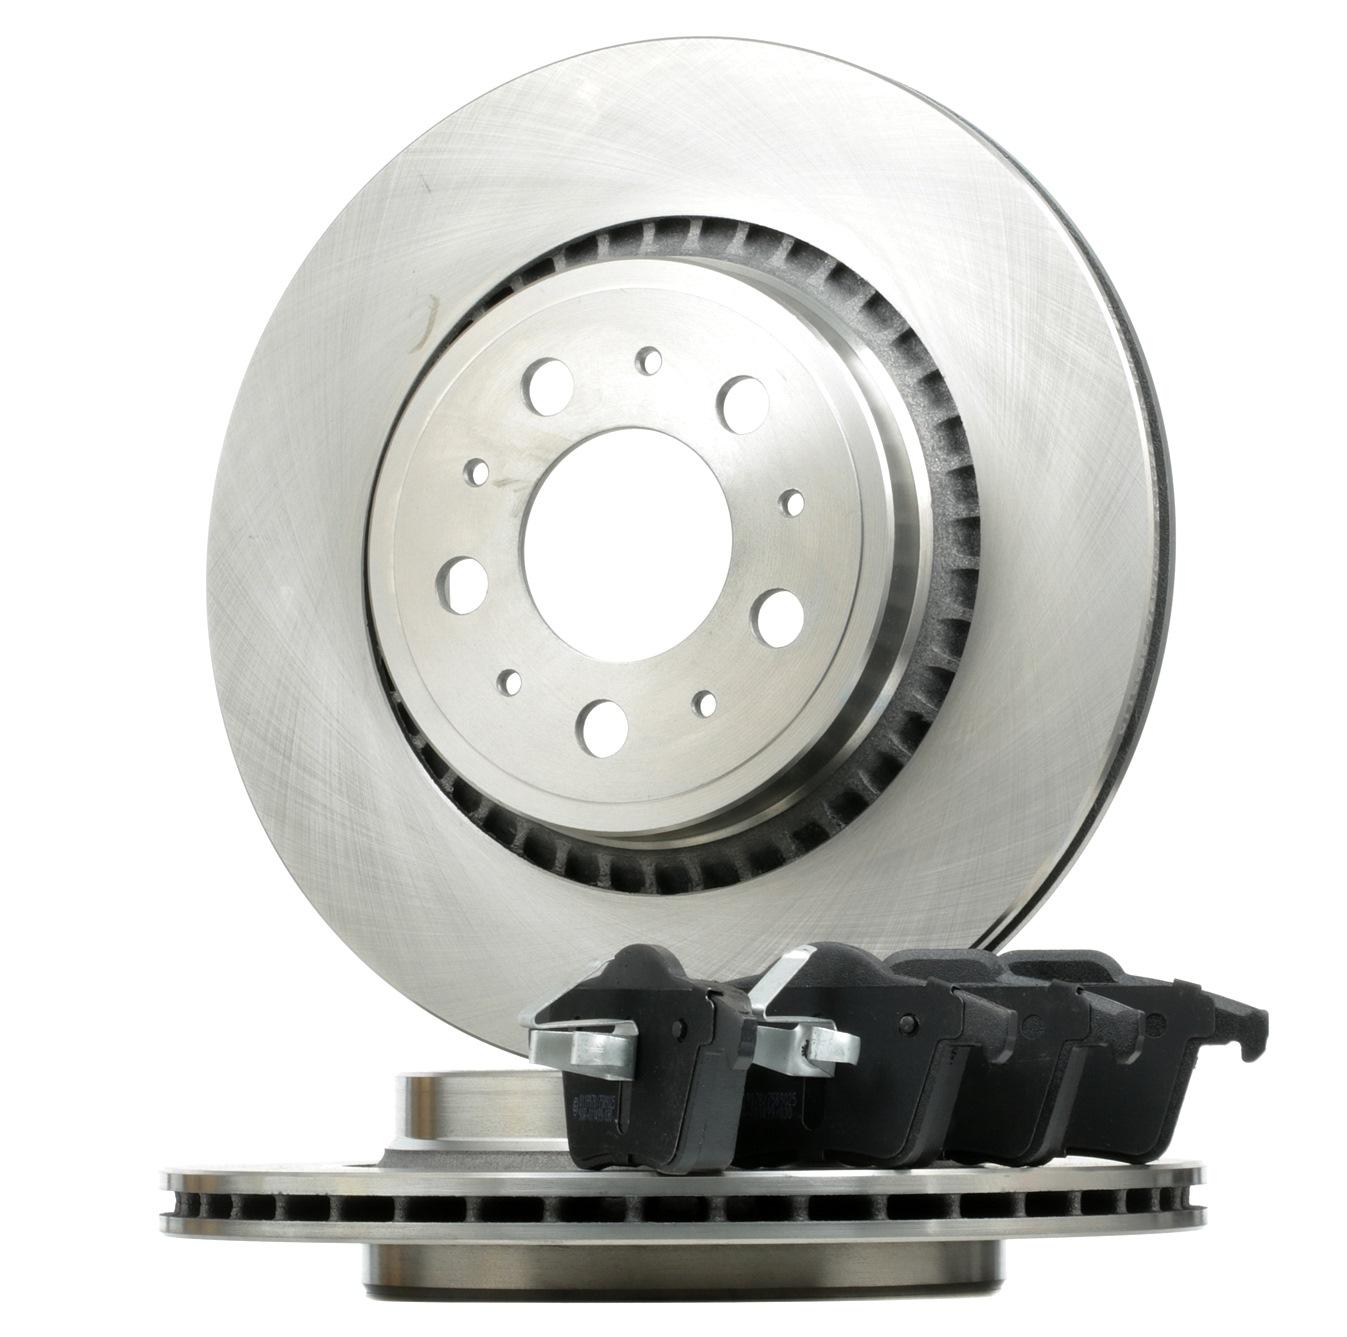 Buy original Brake kit STARK SKBK-10990884